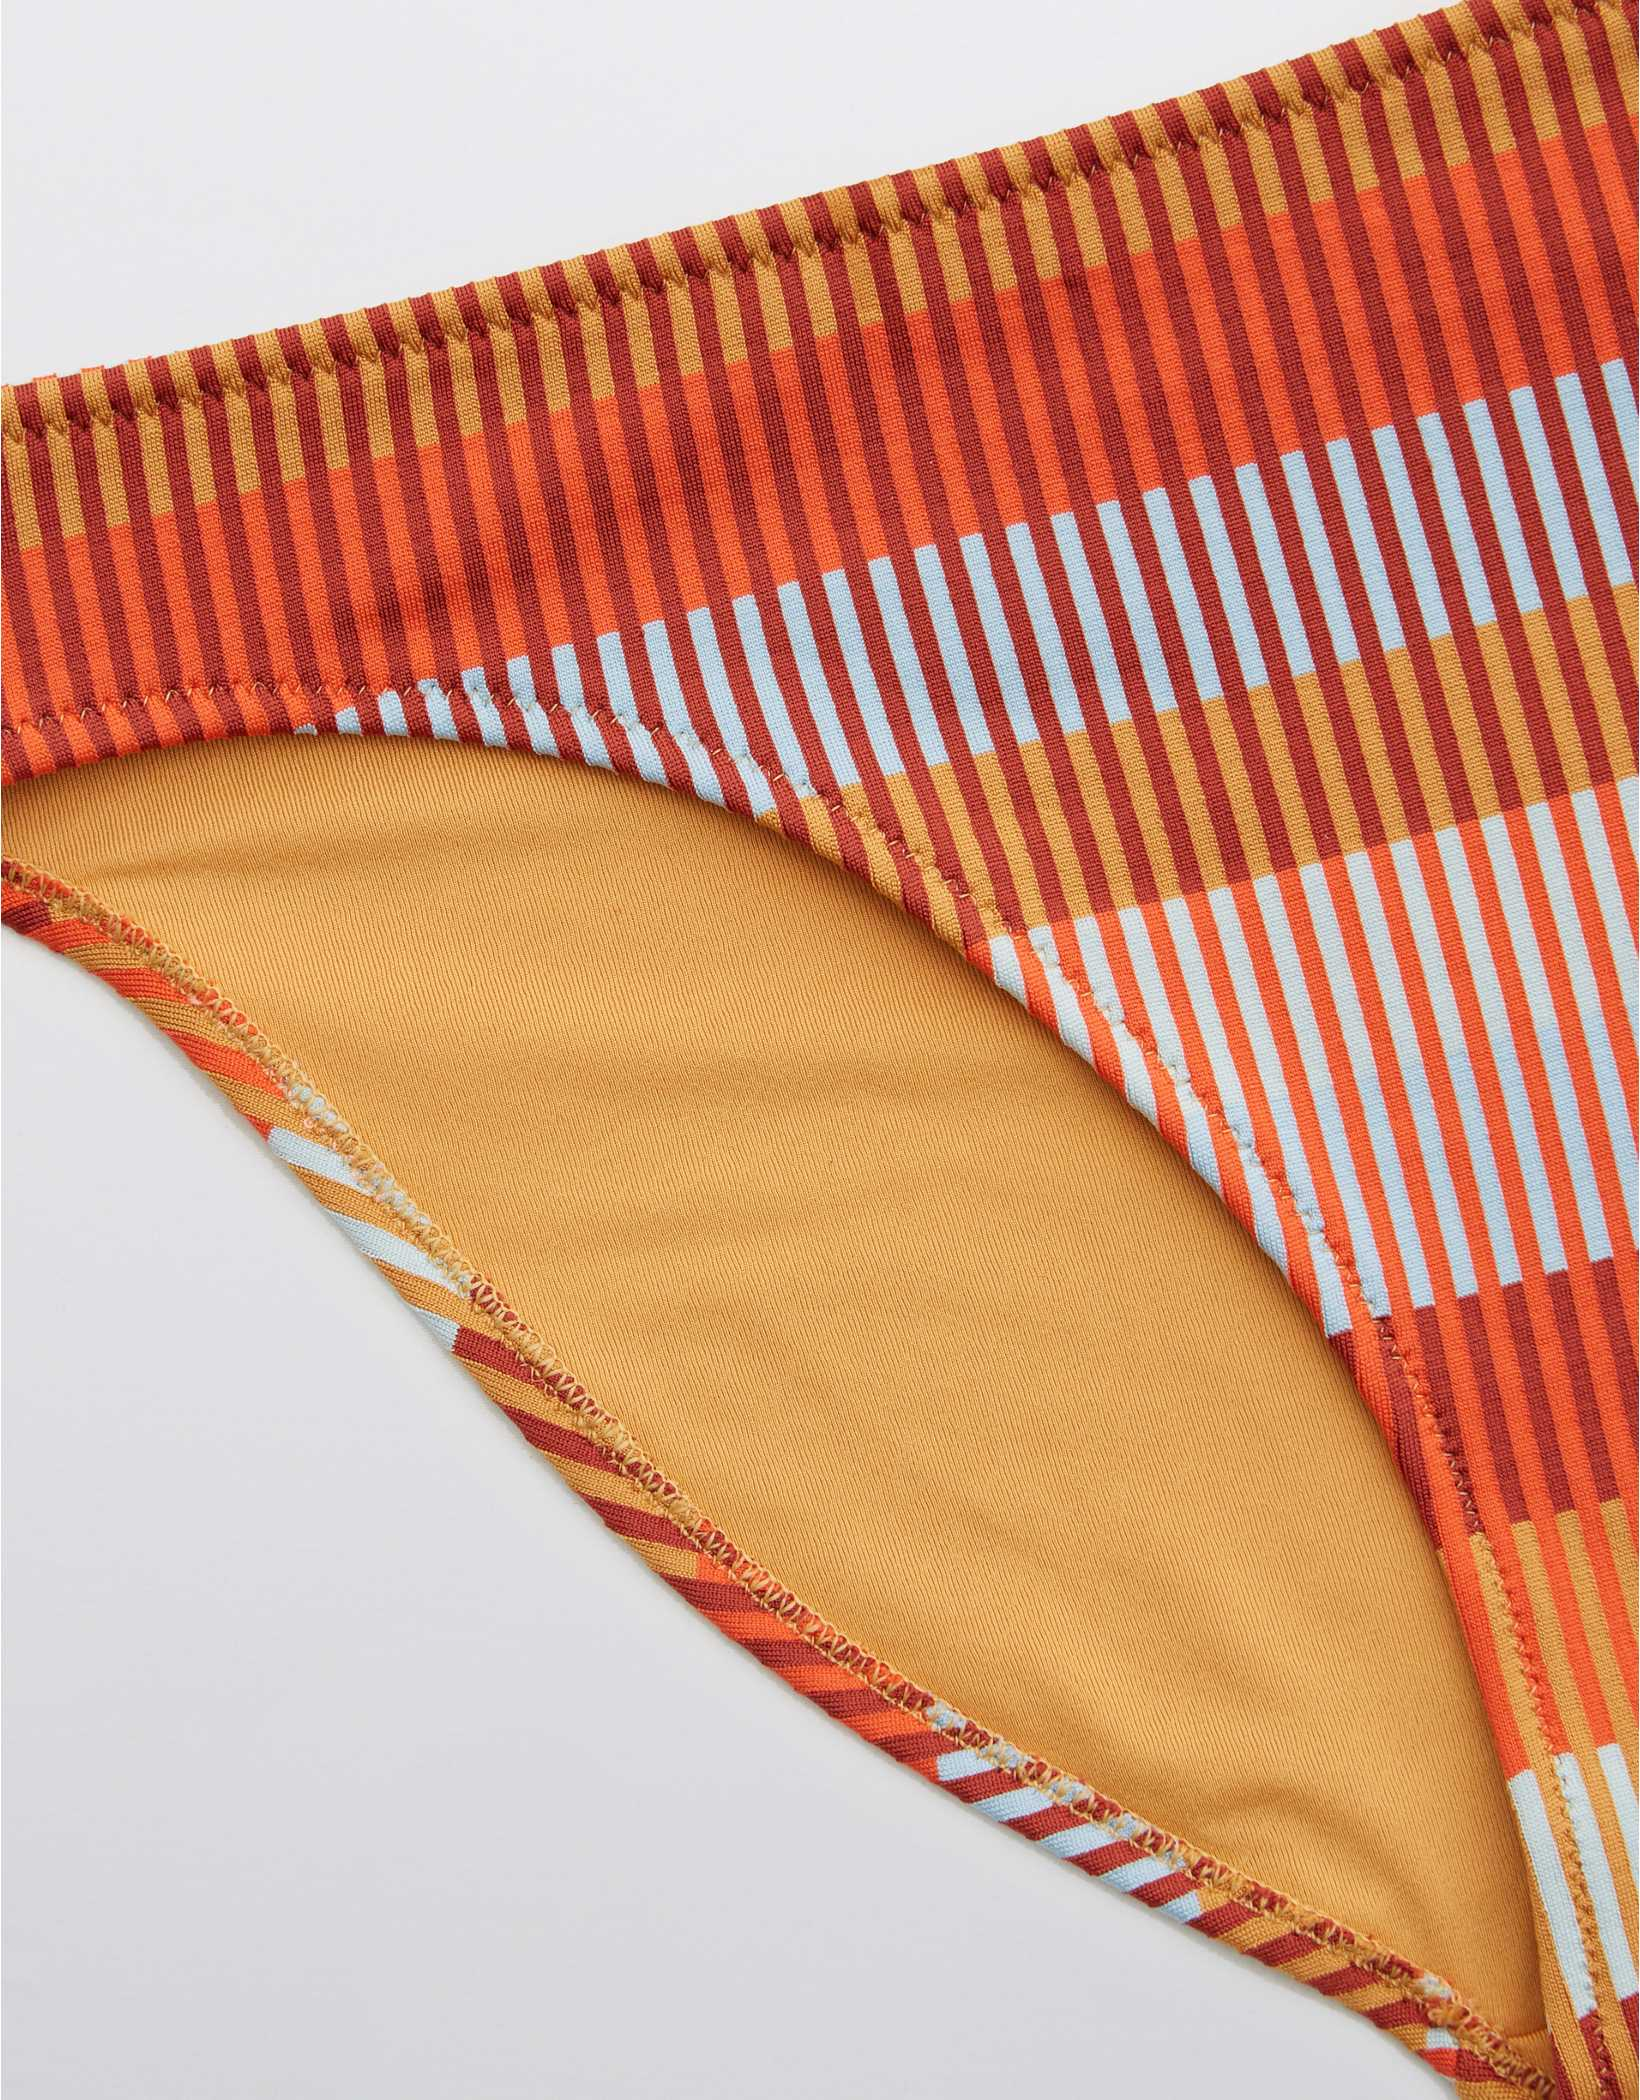 Aerie Jacquard Striped Bikini Bottom